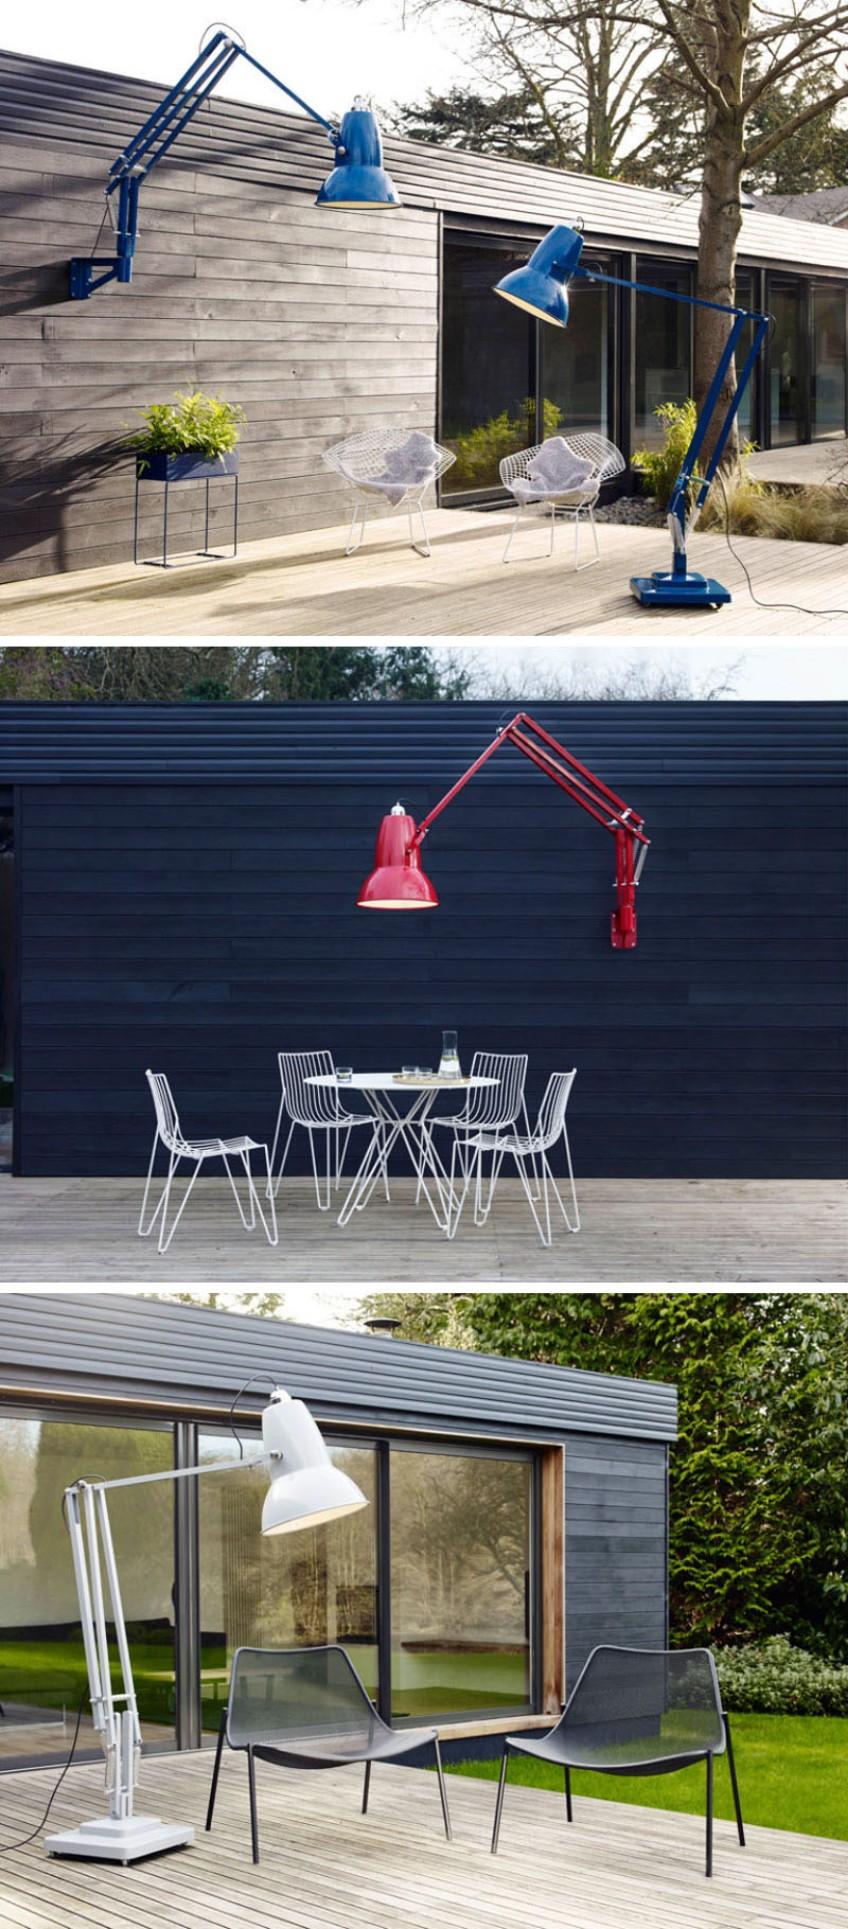 lighting ideas Mood Board: Outdoor Lighting Ideas to Inspire Your Summer Outdoor Lighting Ideas To Inspire Your Summer 2